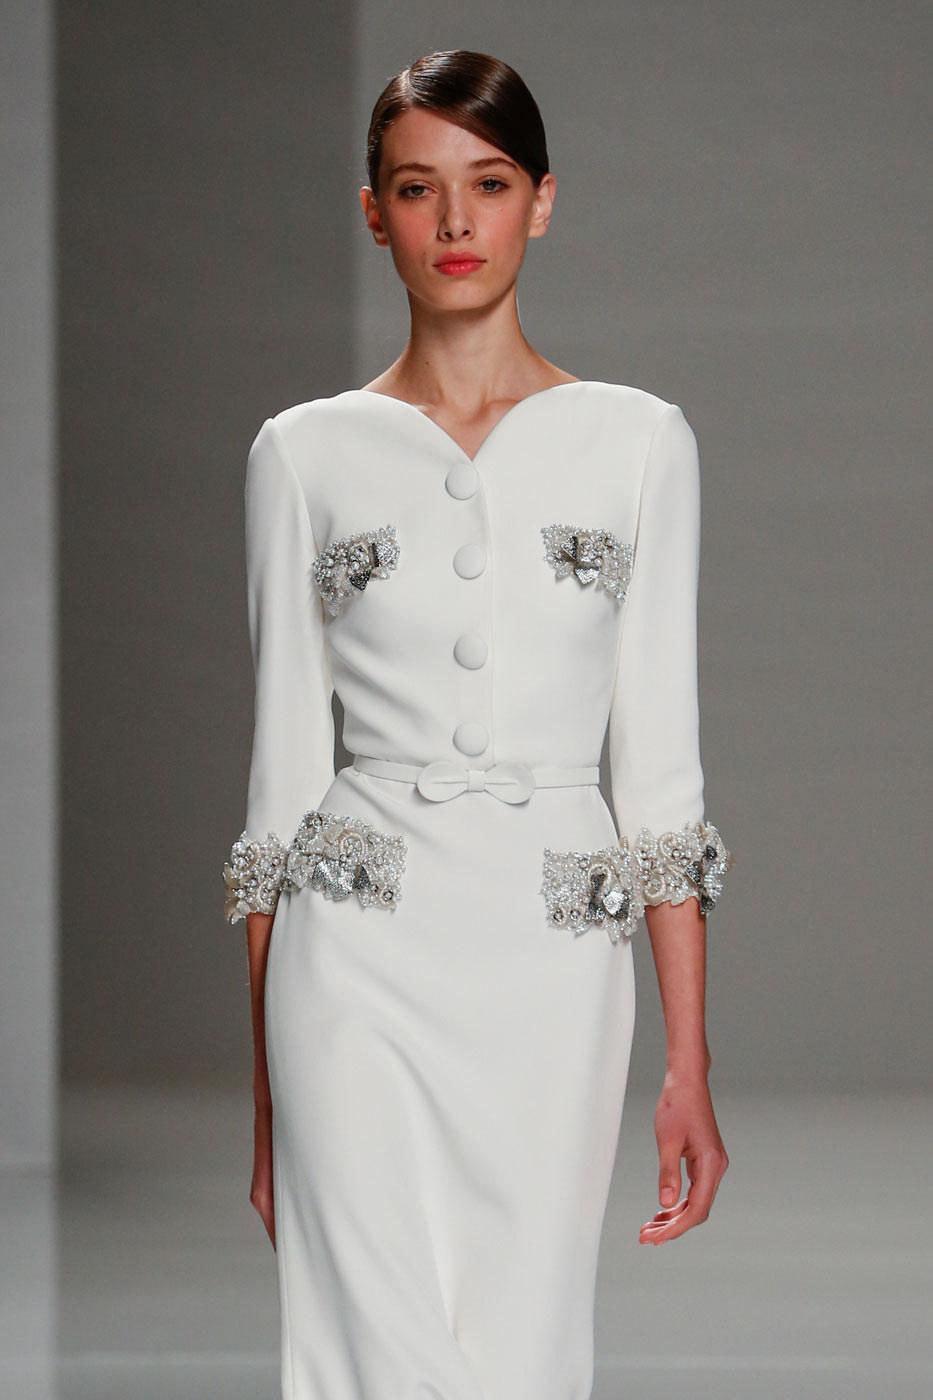 Georges-Hobeika-fashion-runway-show-haute-couture-paris-spring-2015-the-impression-36